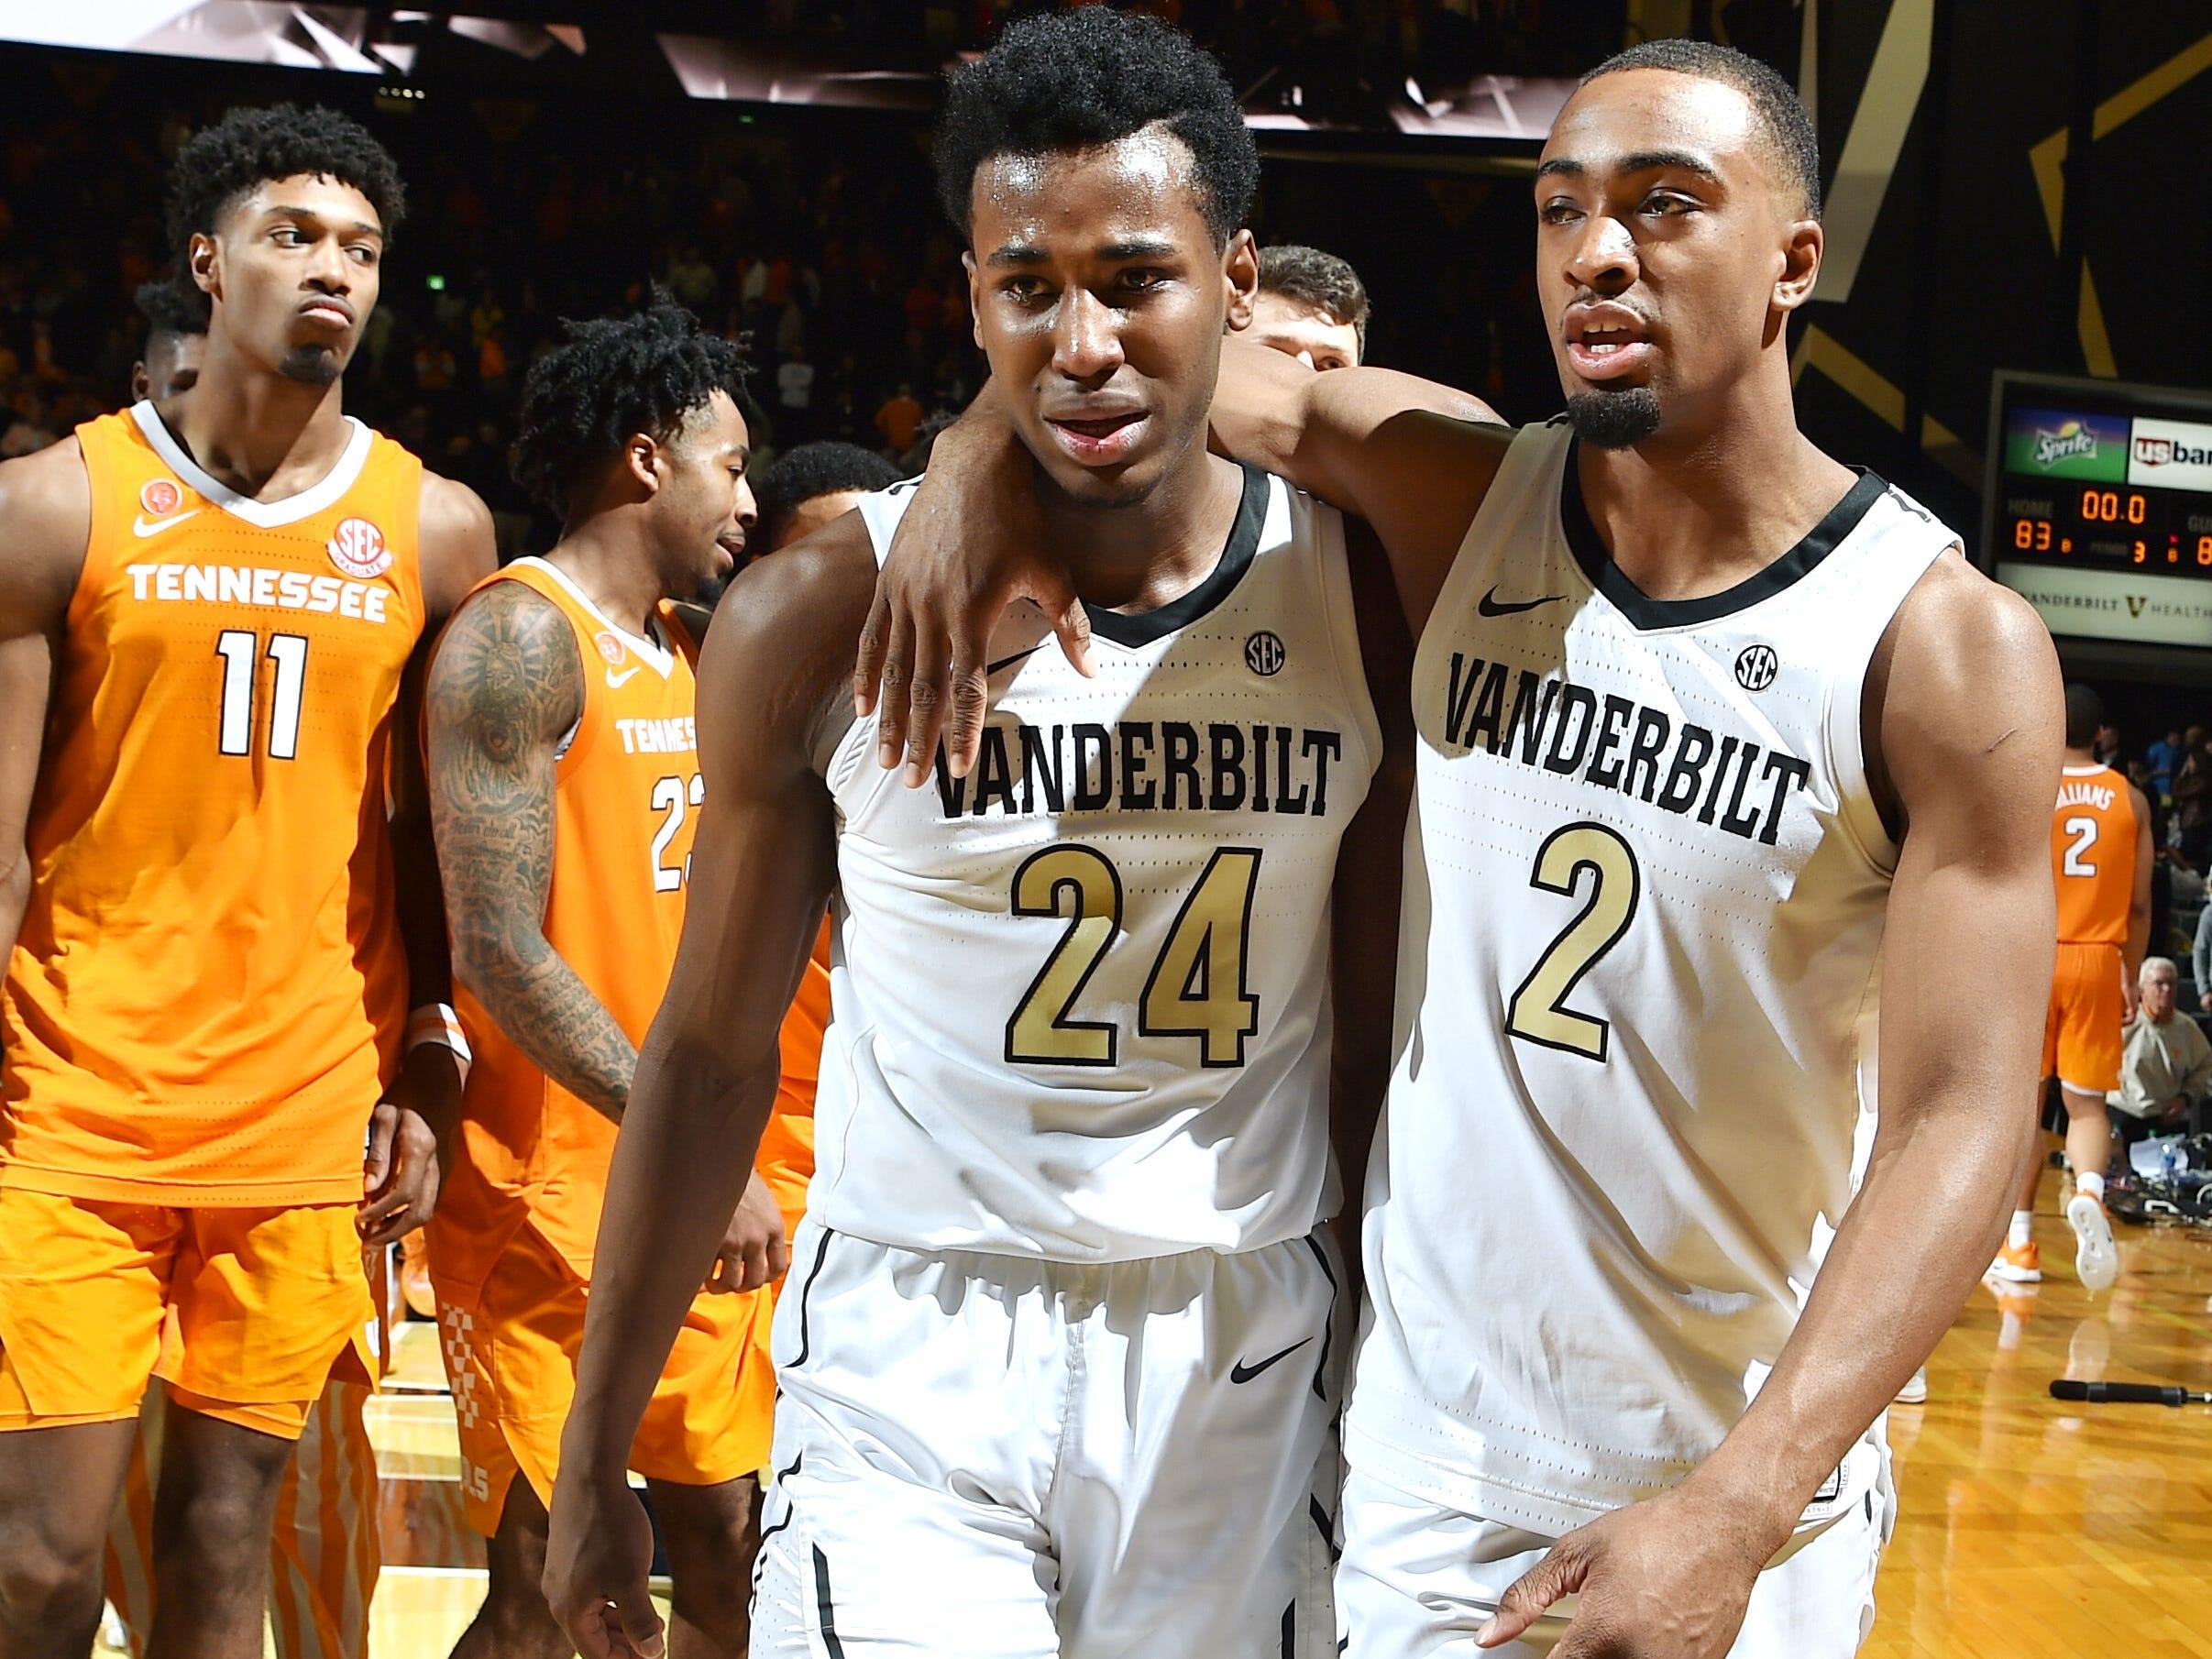 Vanderbilt forward Aaron Nesmith (24) and Vanderbilt guard/forward Joe Toye (2) react to the loss at Memorial Gym in Nashville, Tenn., Wednesday, Jan. 23, 2019.